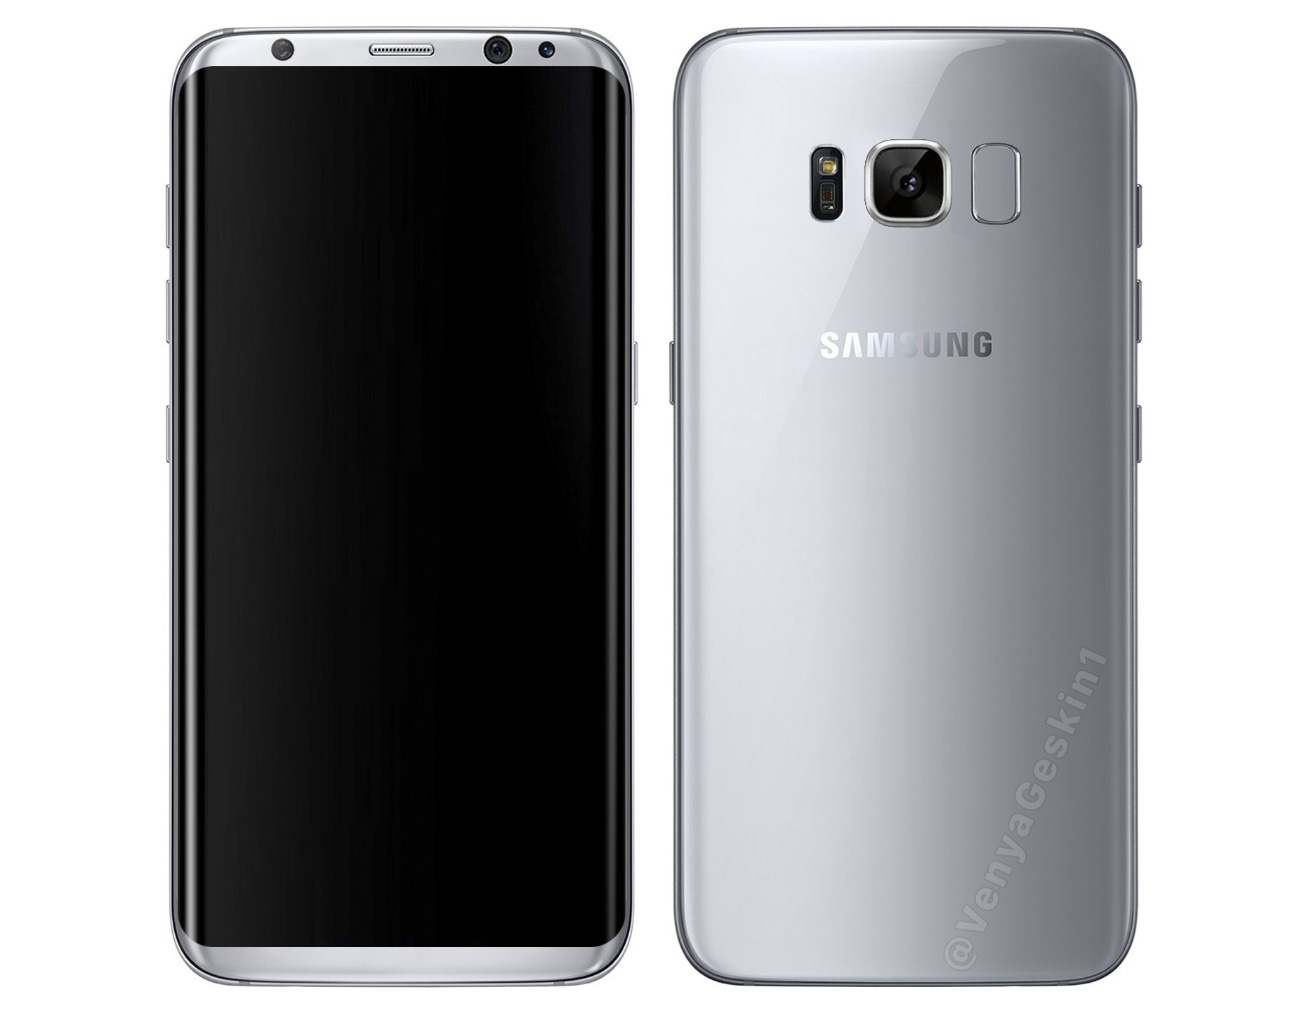 Samsung Galaxy S8 Leaked Render Image | Image credit: Veniamin Geskin